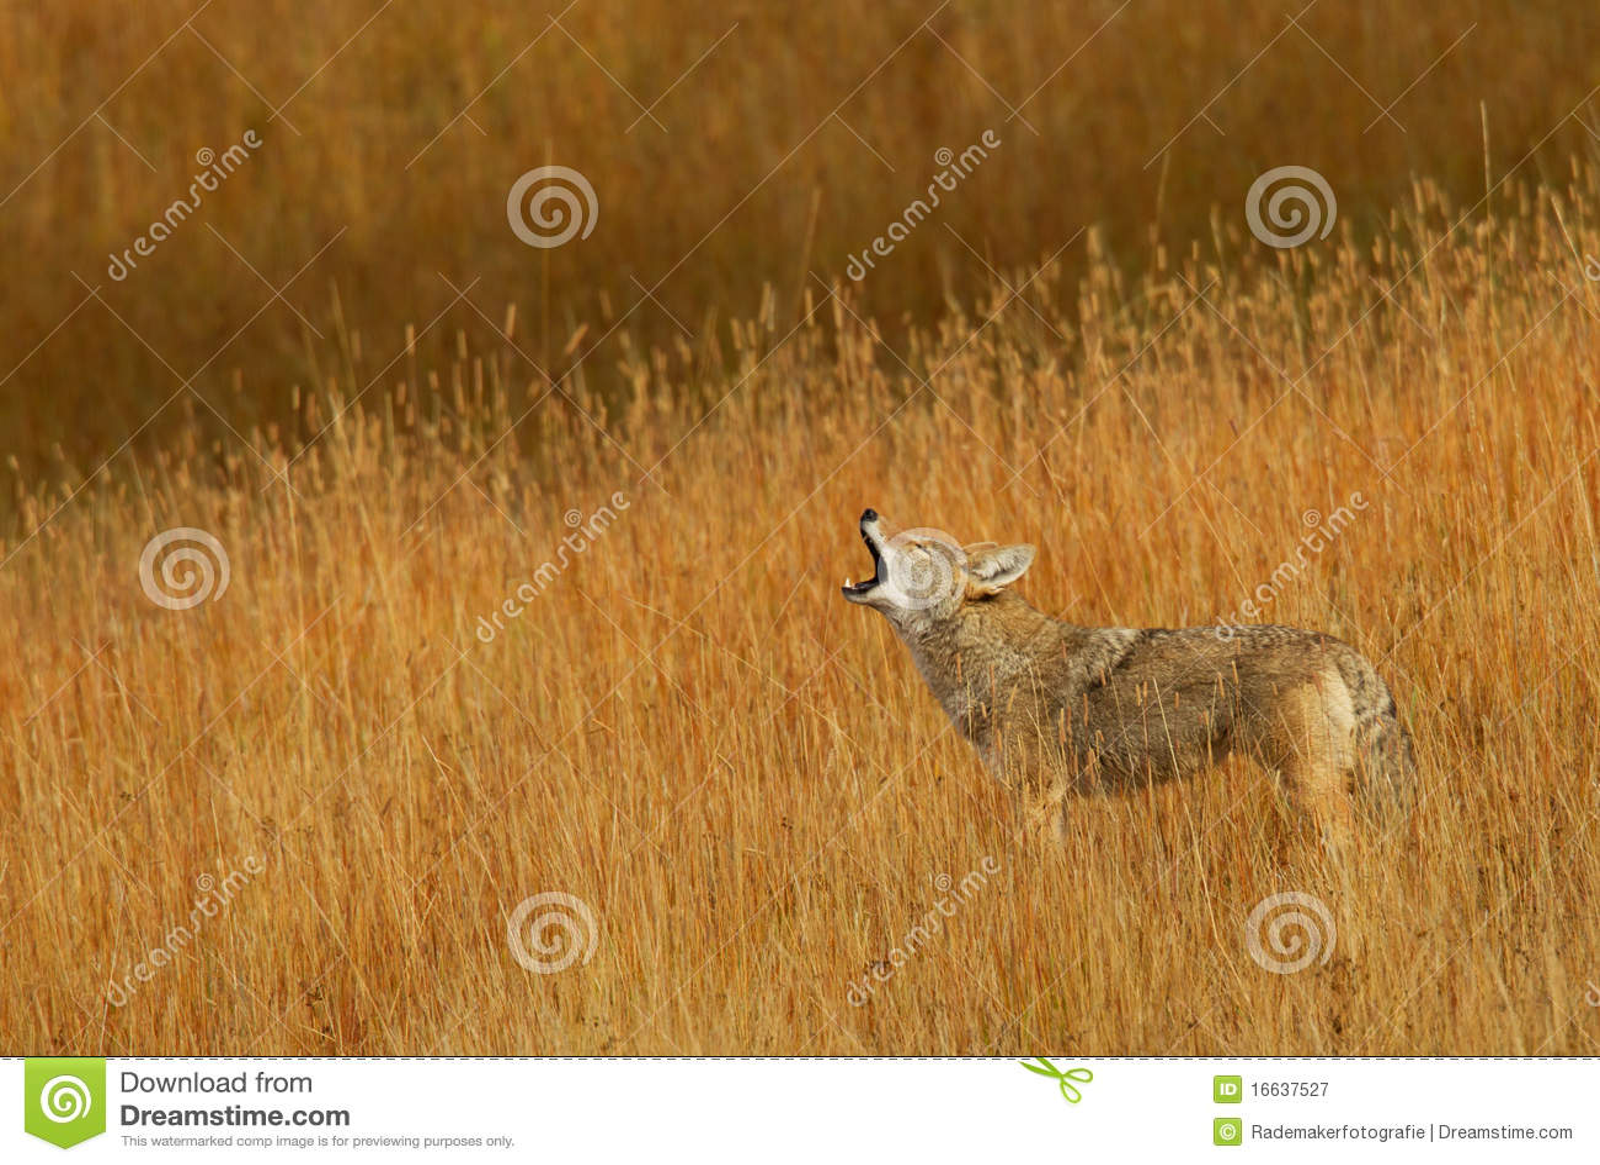 Calling Coyote